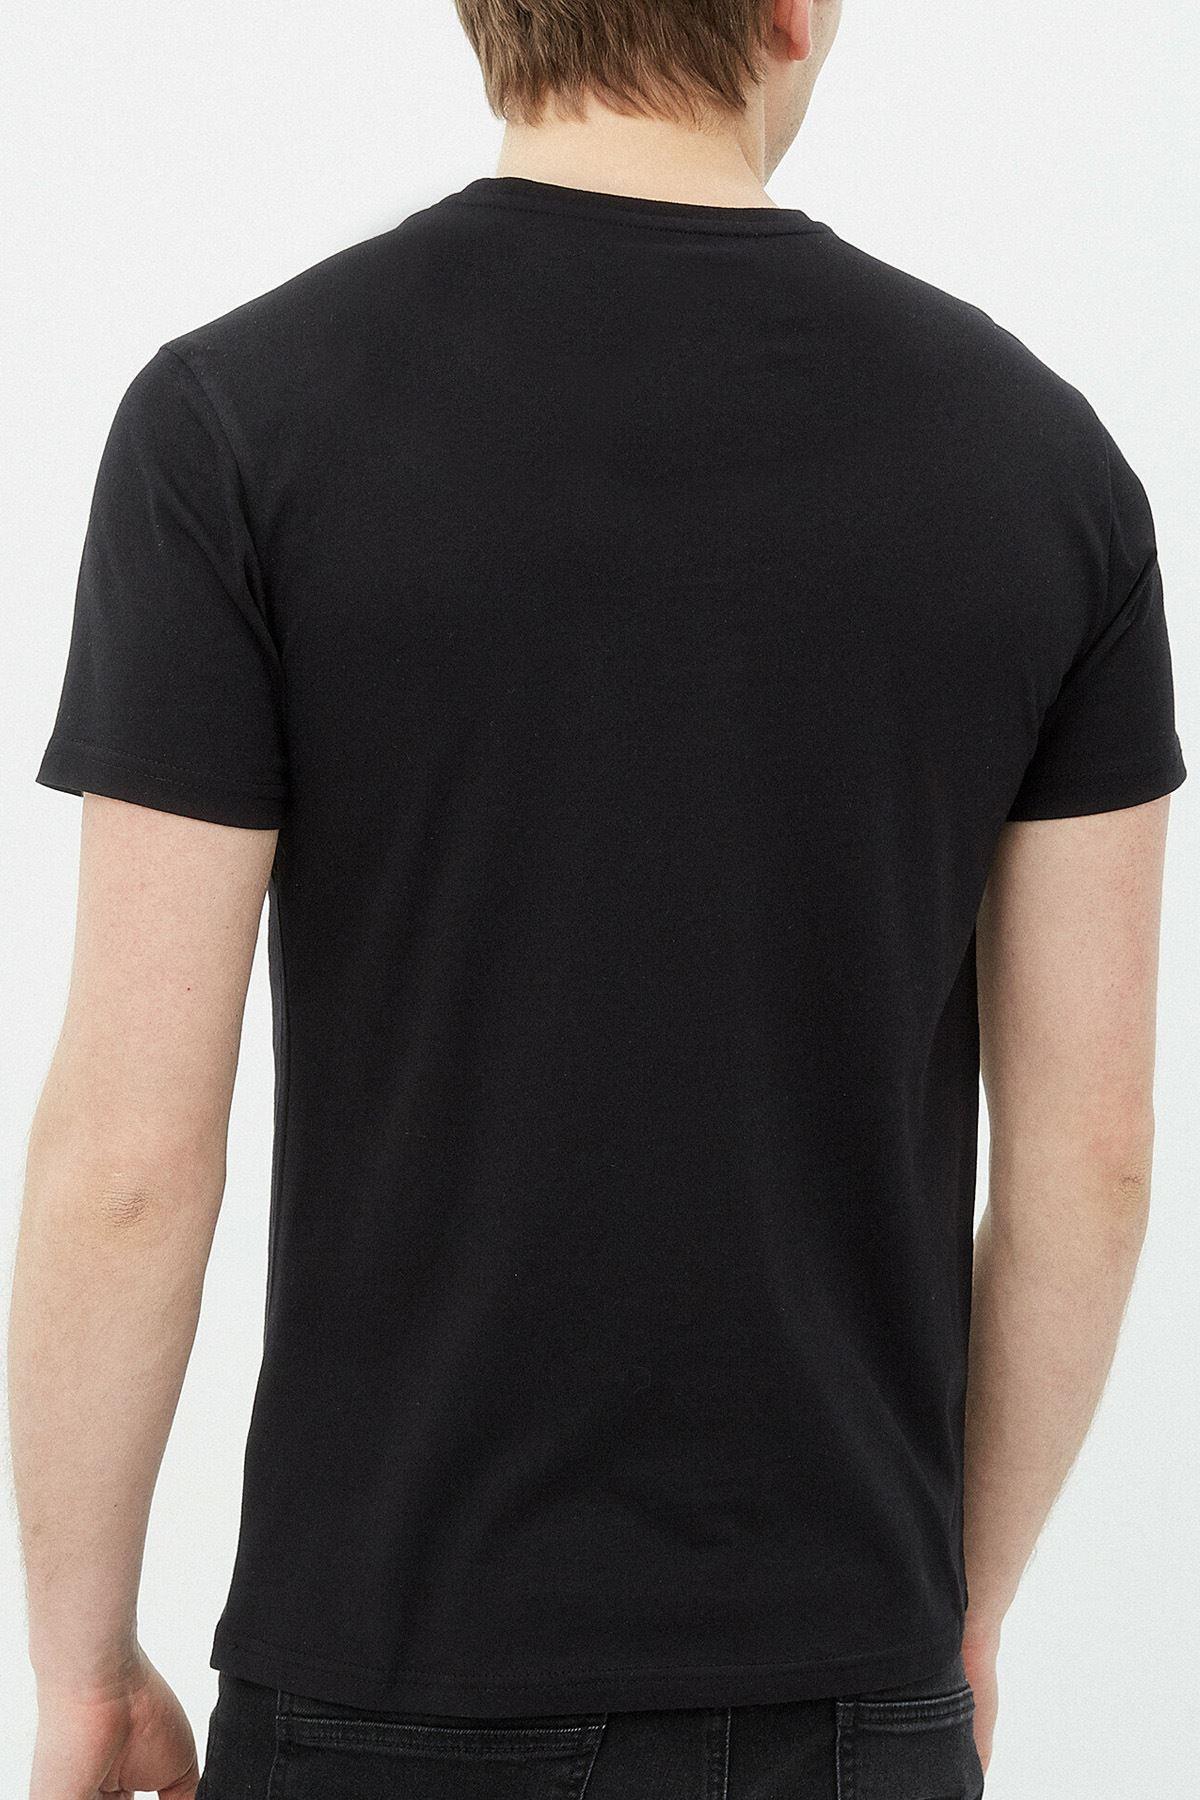 Anime Death Note 03 Siyah Erkek Tshirt - Tişört